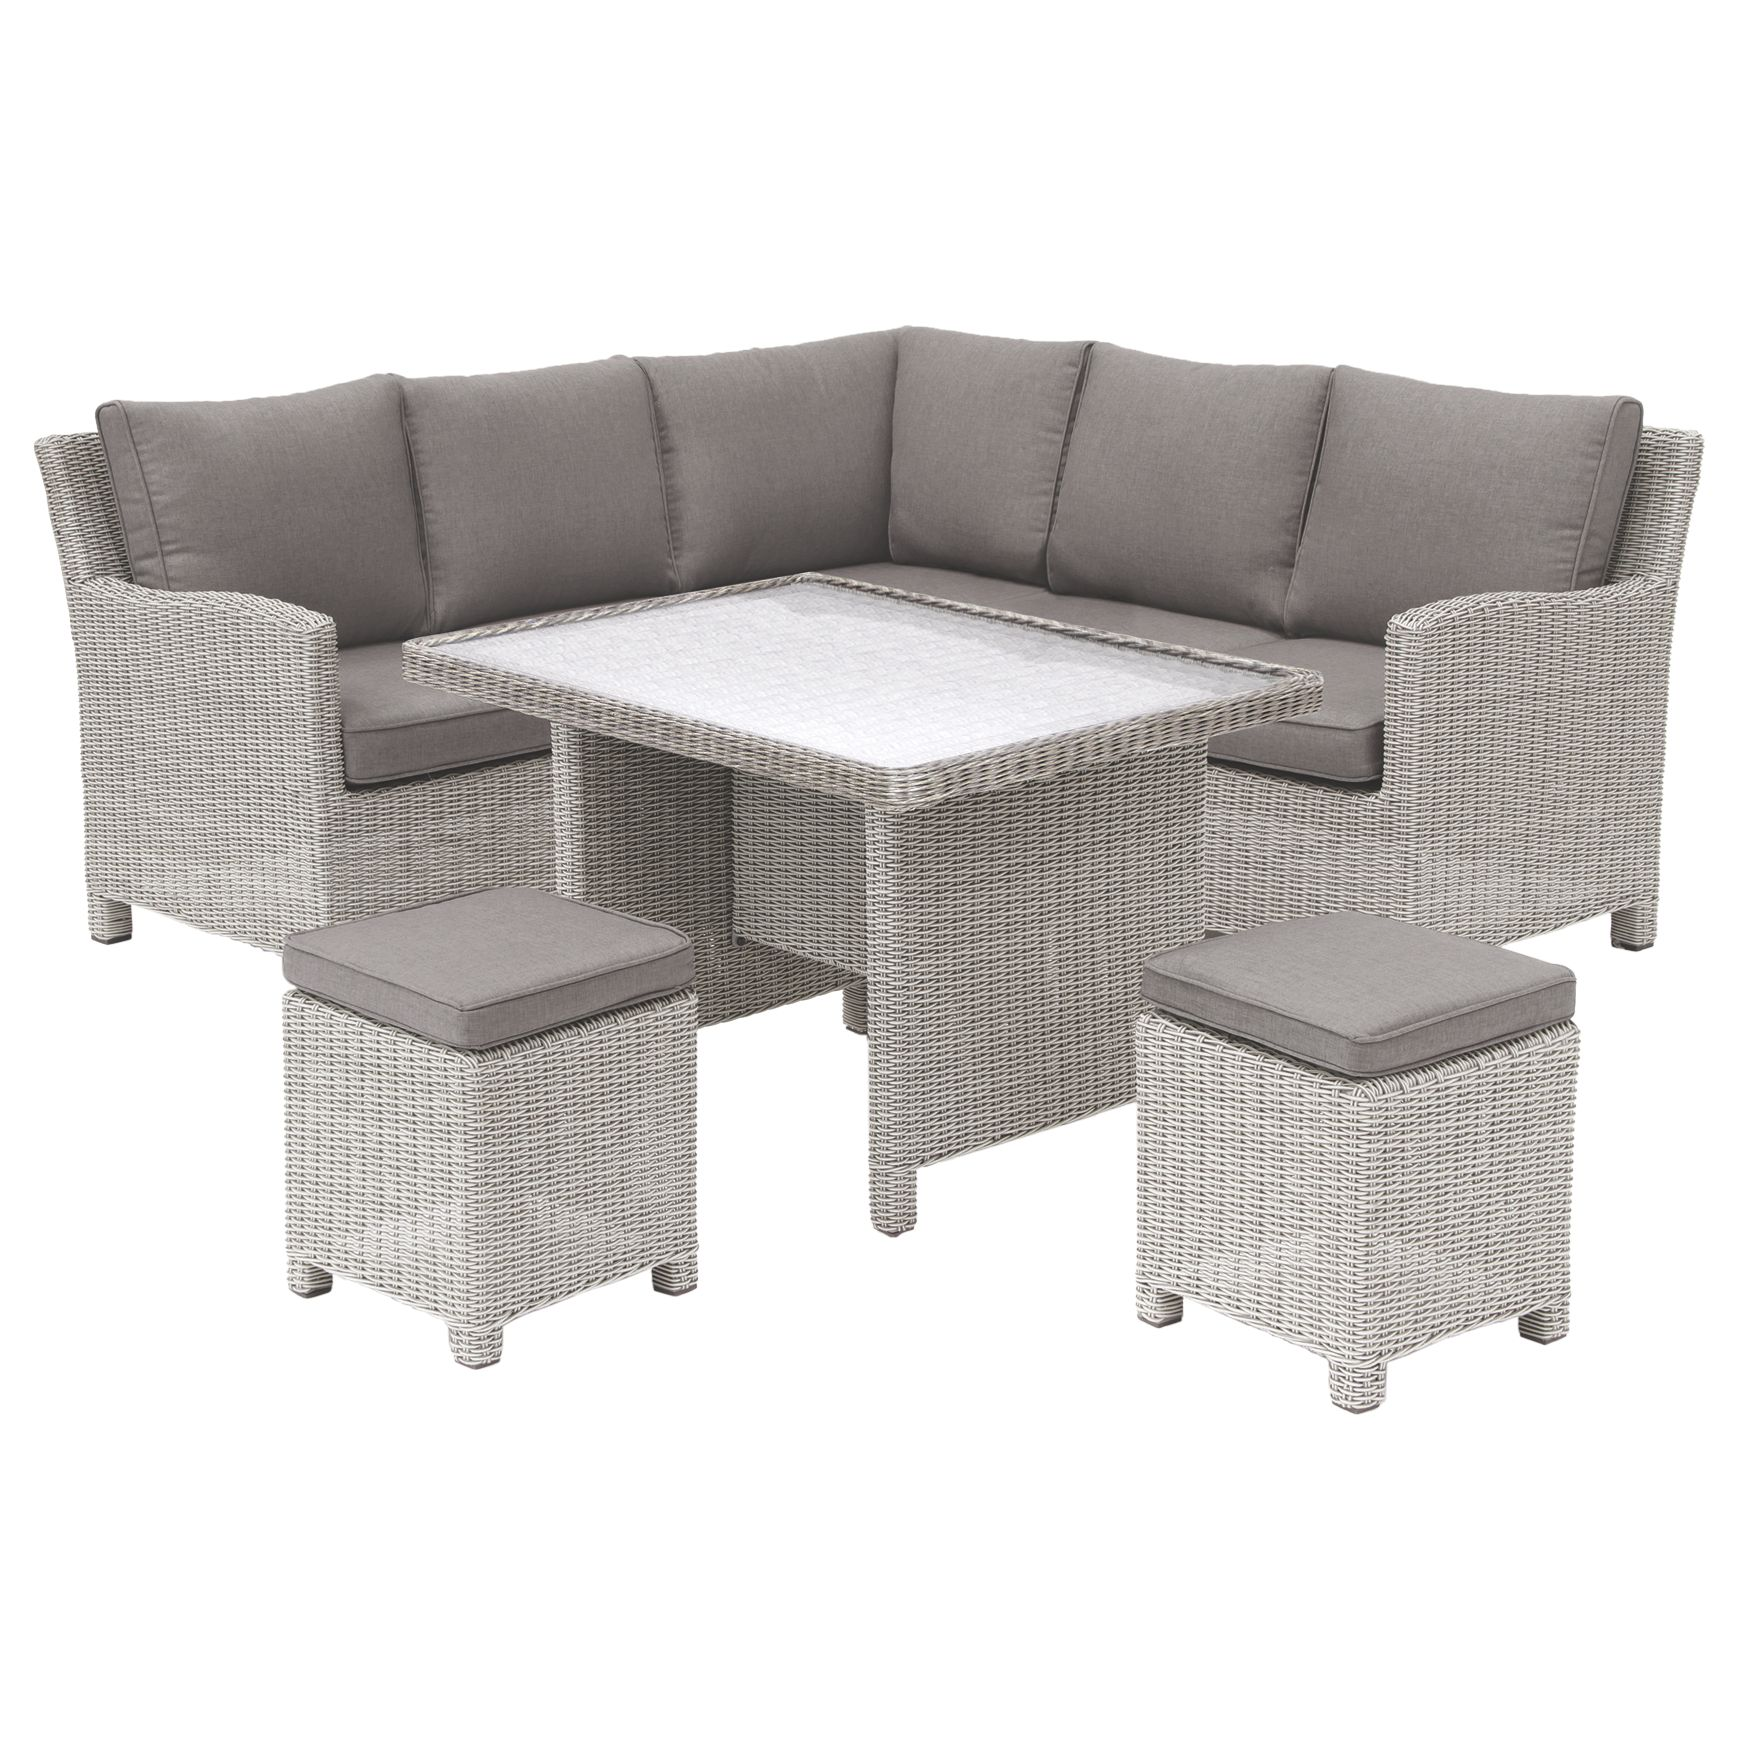 Kettler KETTLER Palma Garden Mini Lounge / Dining Set With Glass Top Table